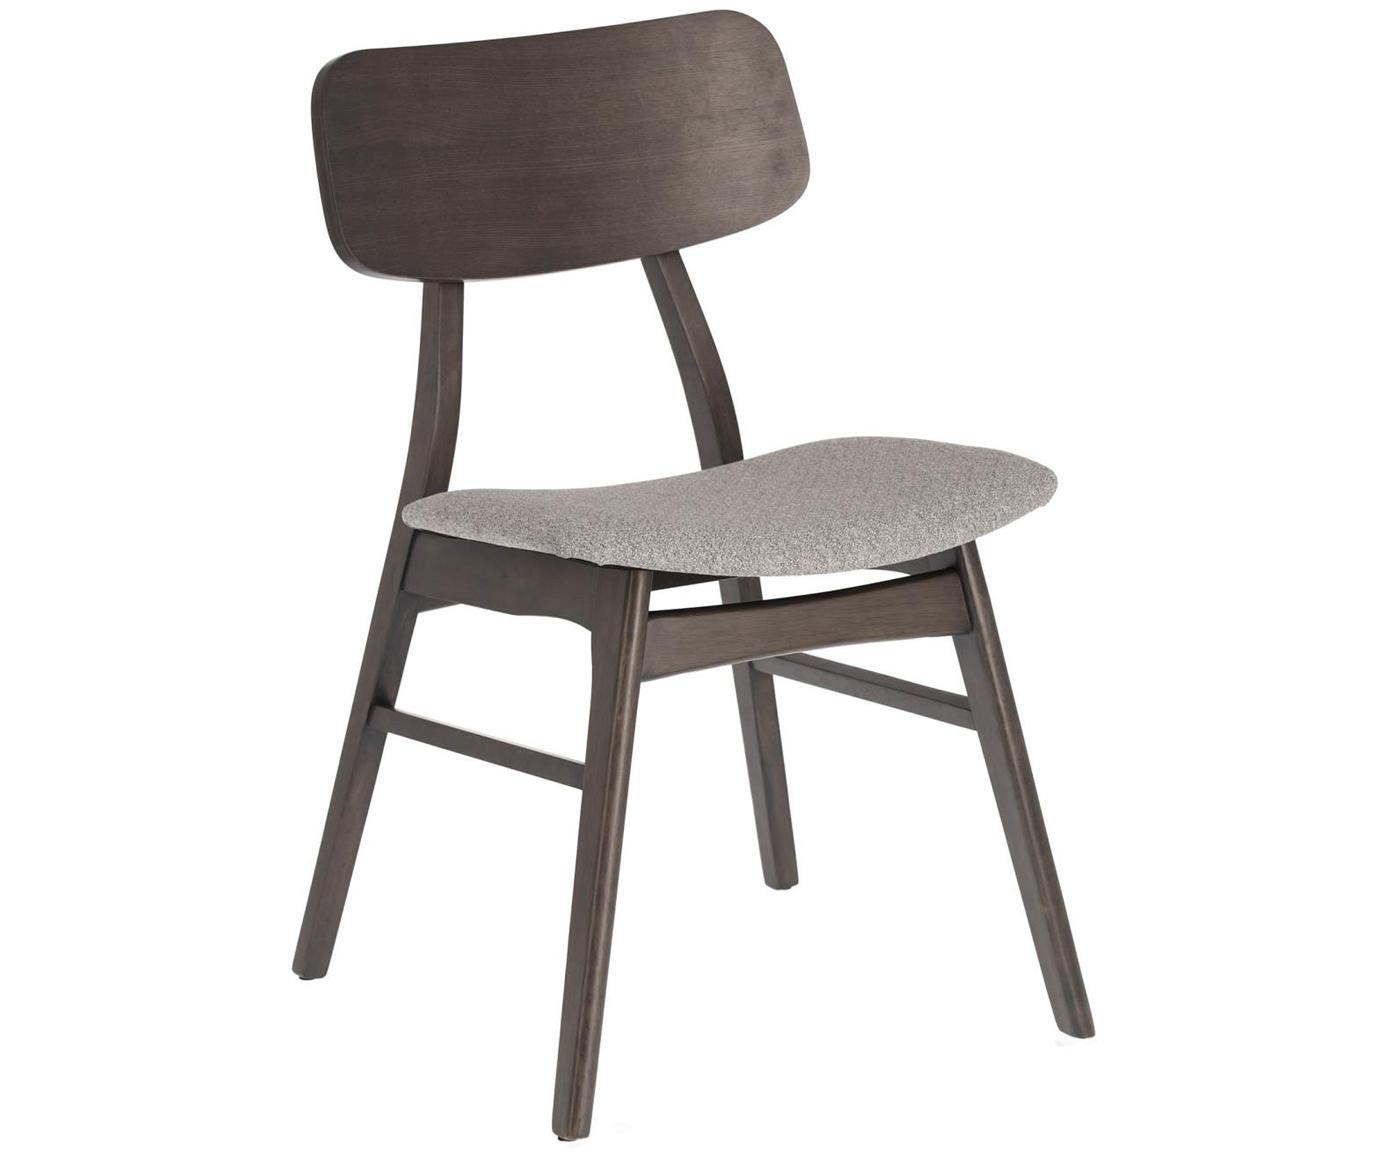 Houten stoelen Selia, 2 stuks, Frame: massief rubberhout, essen, Bekleding: polyester, Grijstinten, B 48 x D 53 cm